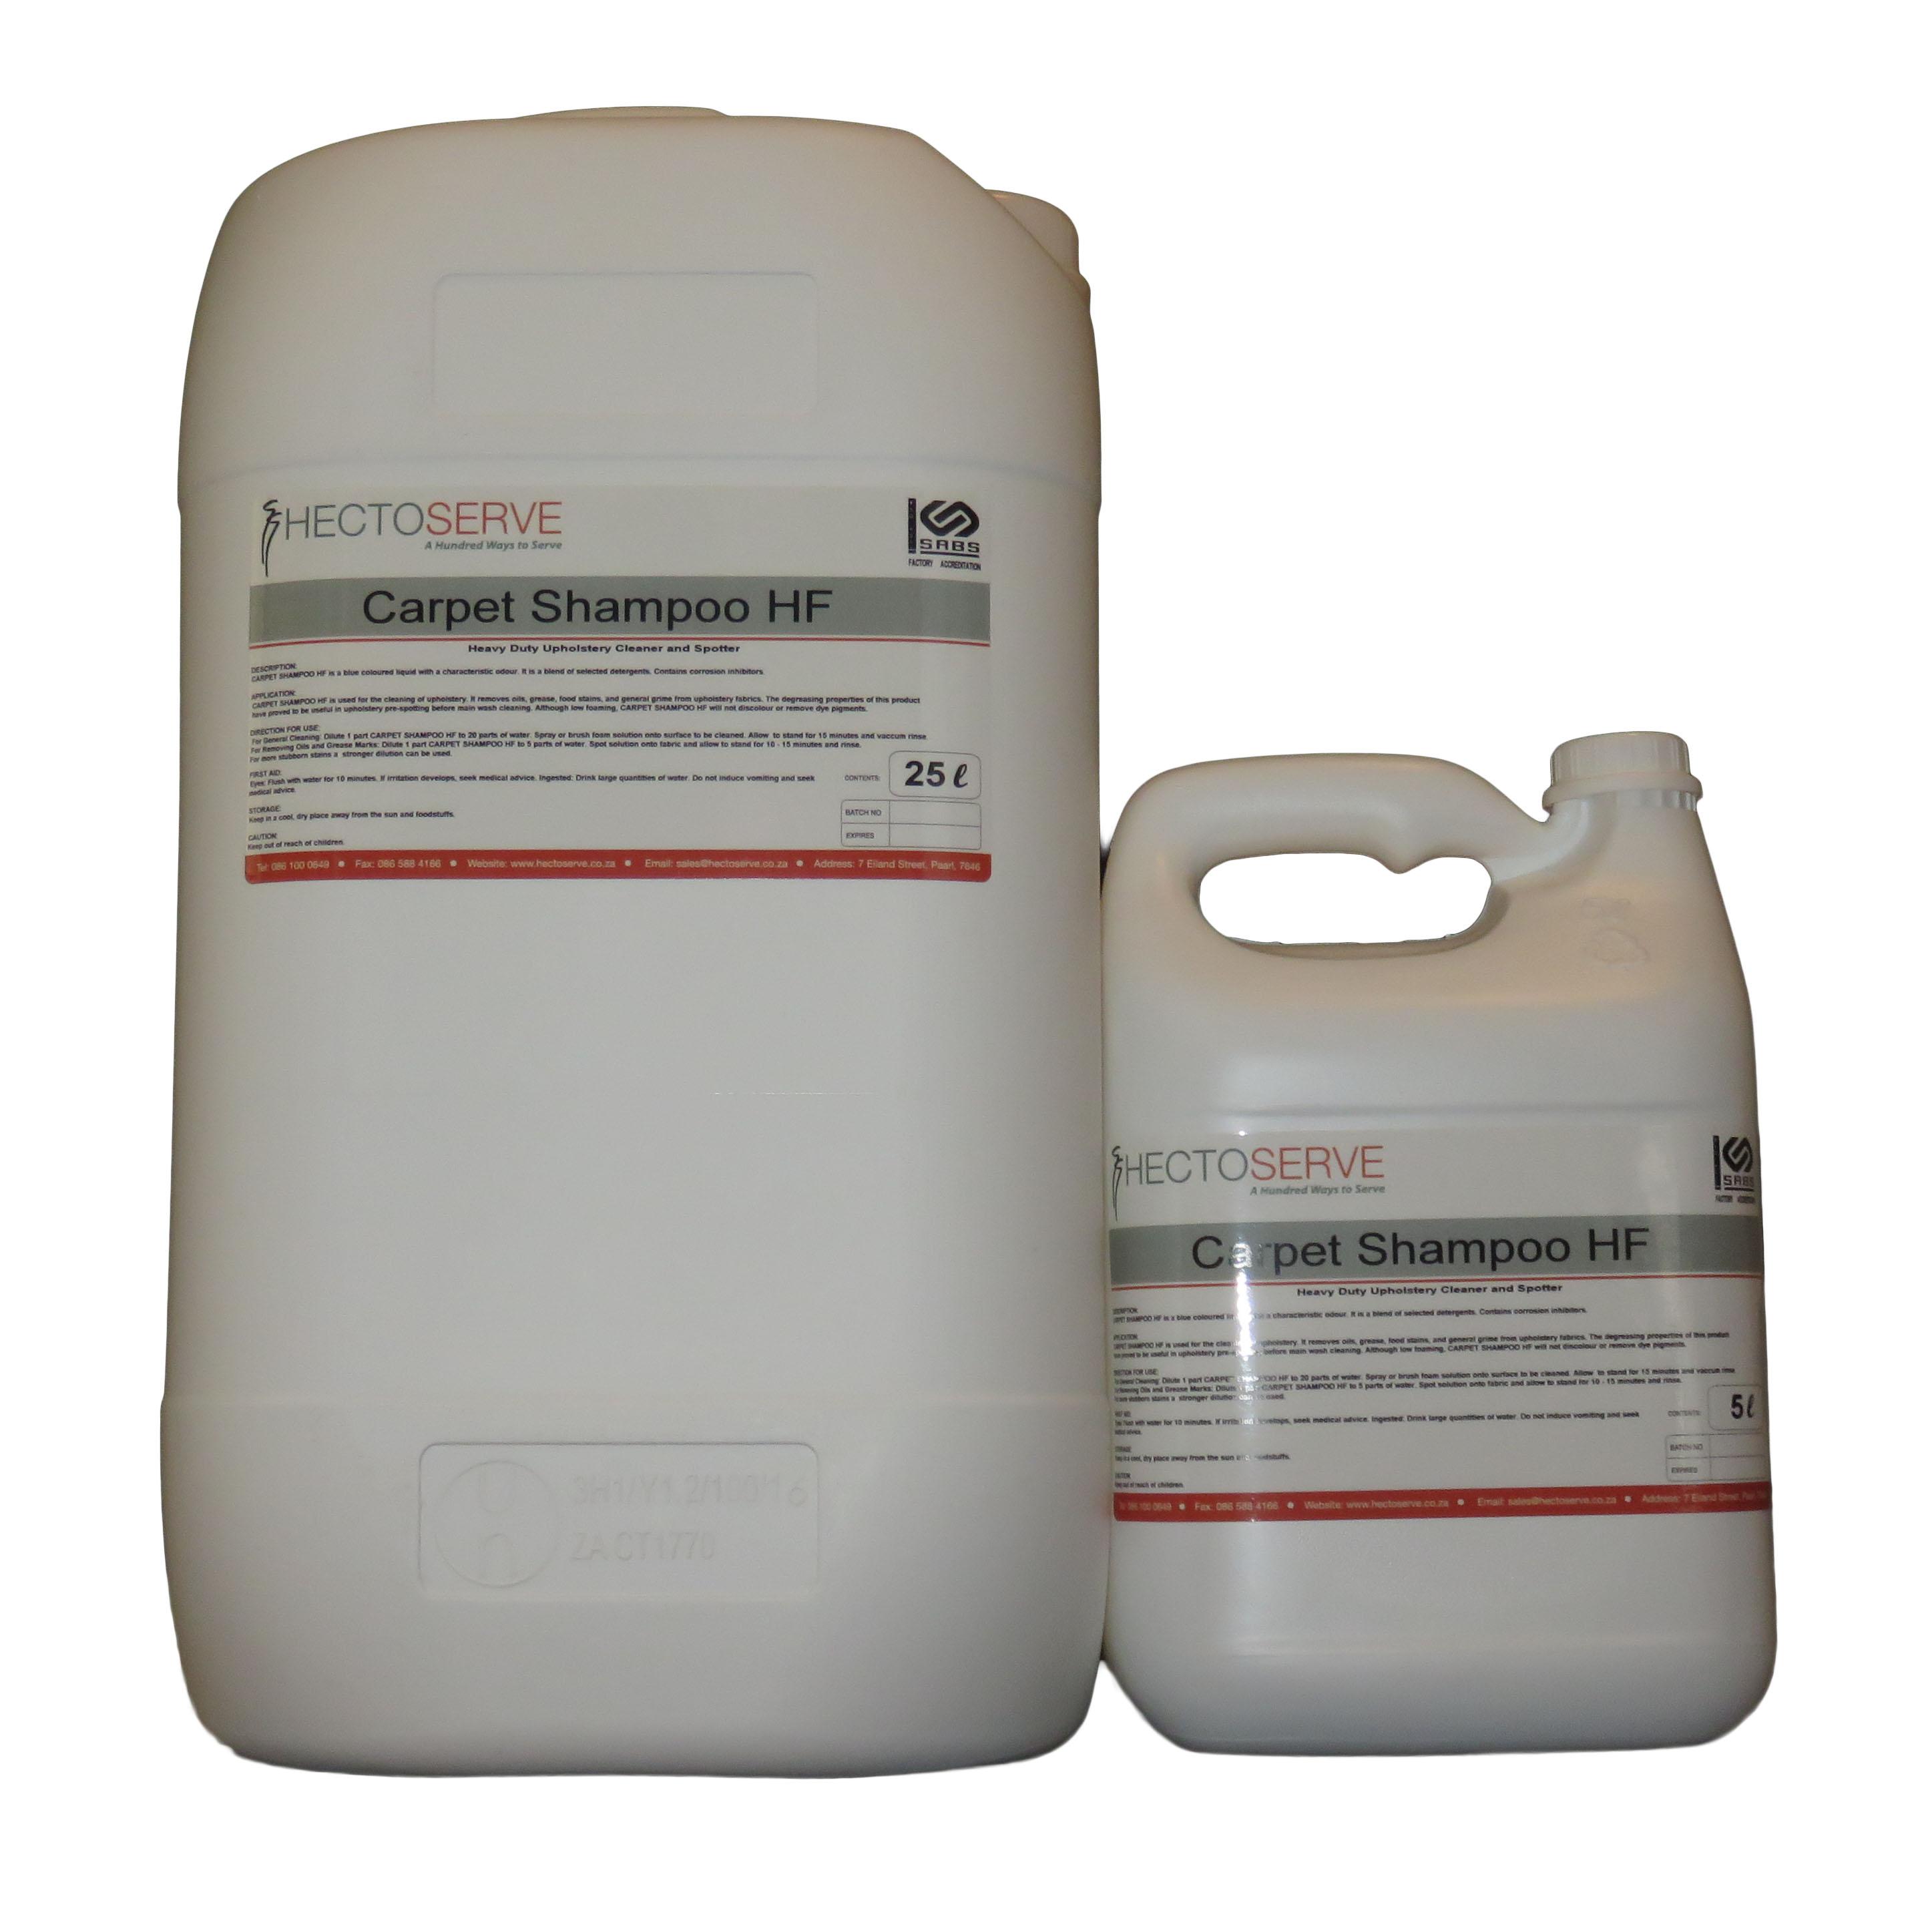 Hectoserve Carpet Shampoo High Foam